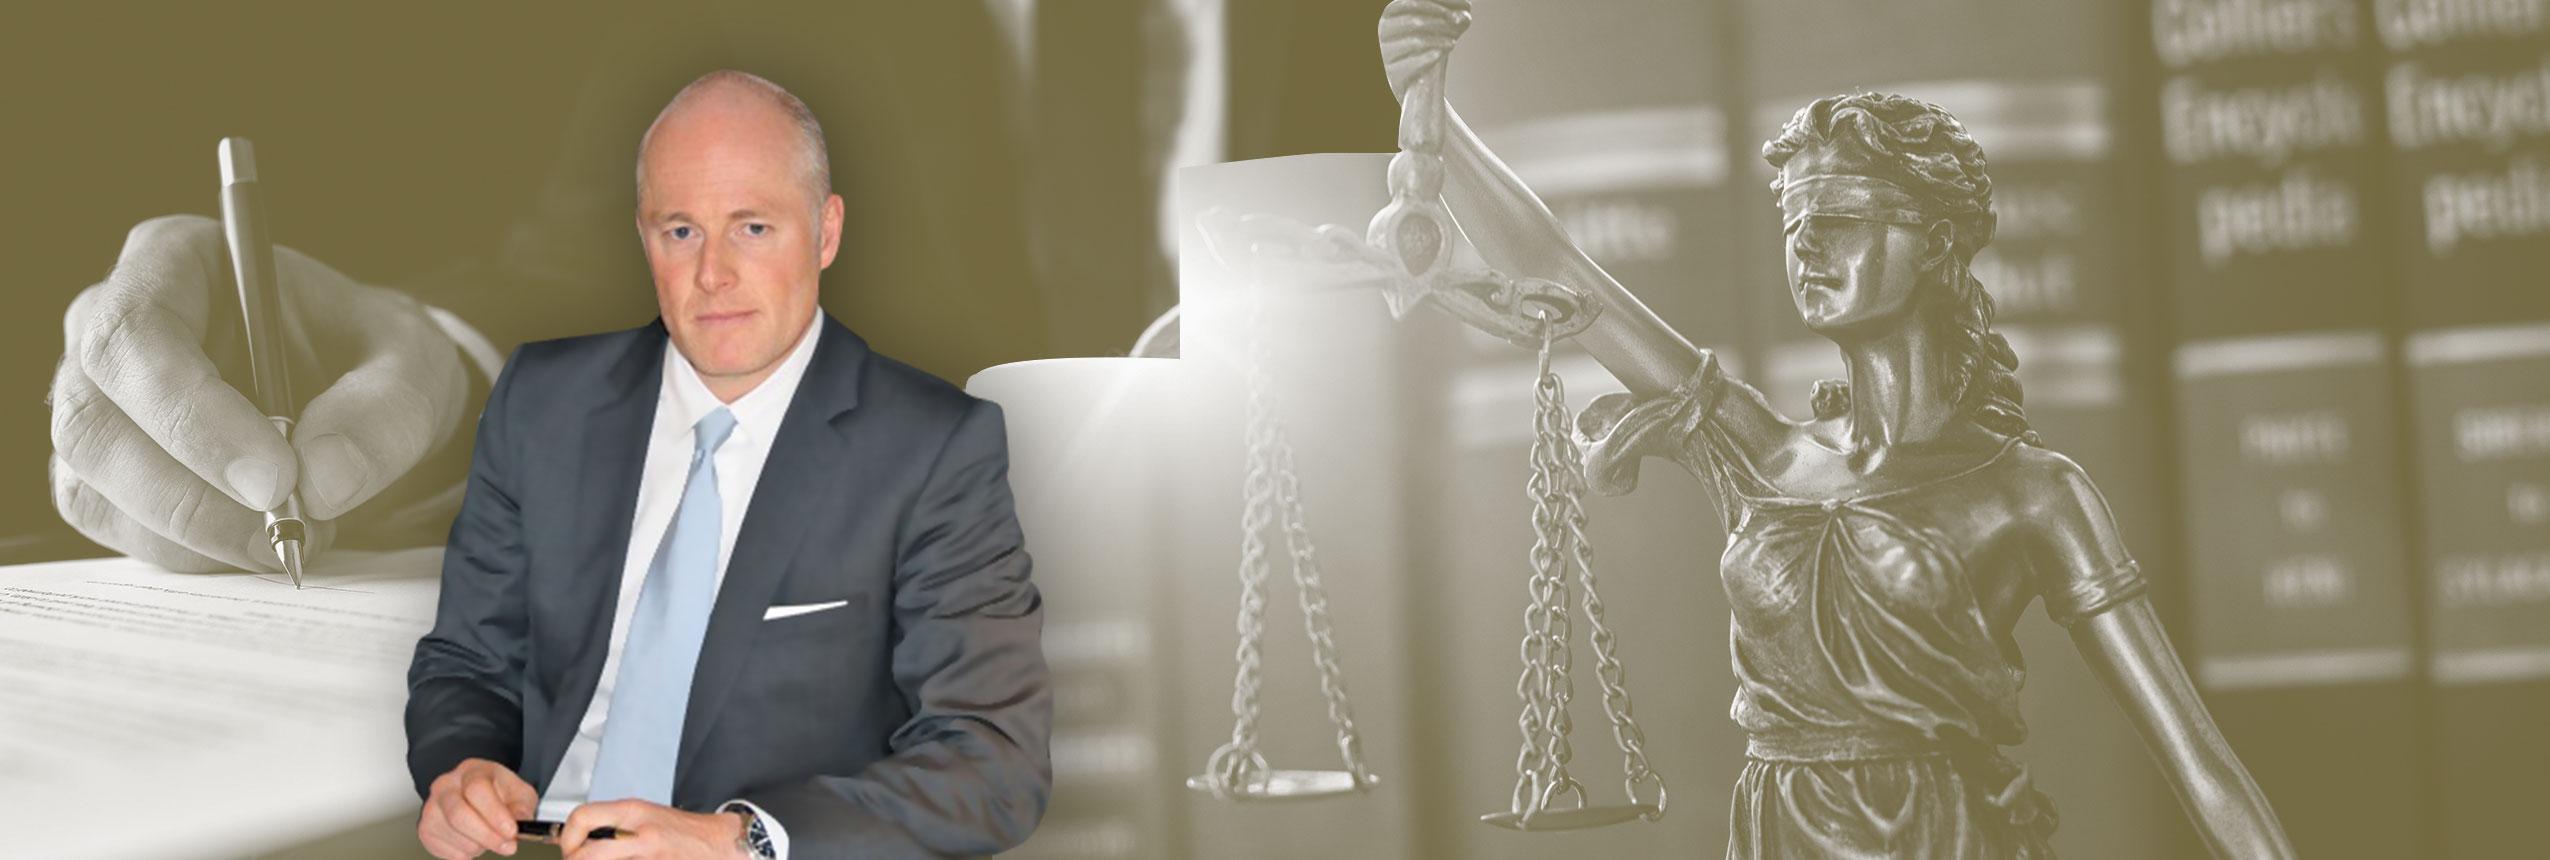 rechtsanwalt dr simon vita 1 - Vita